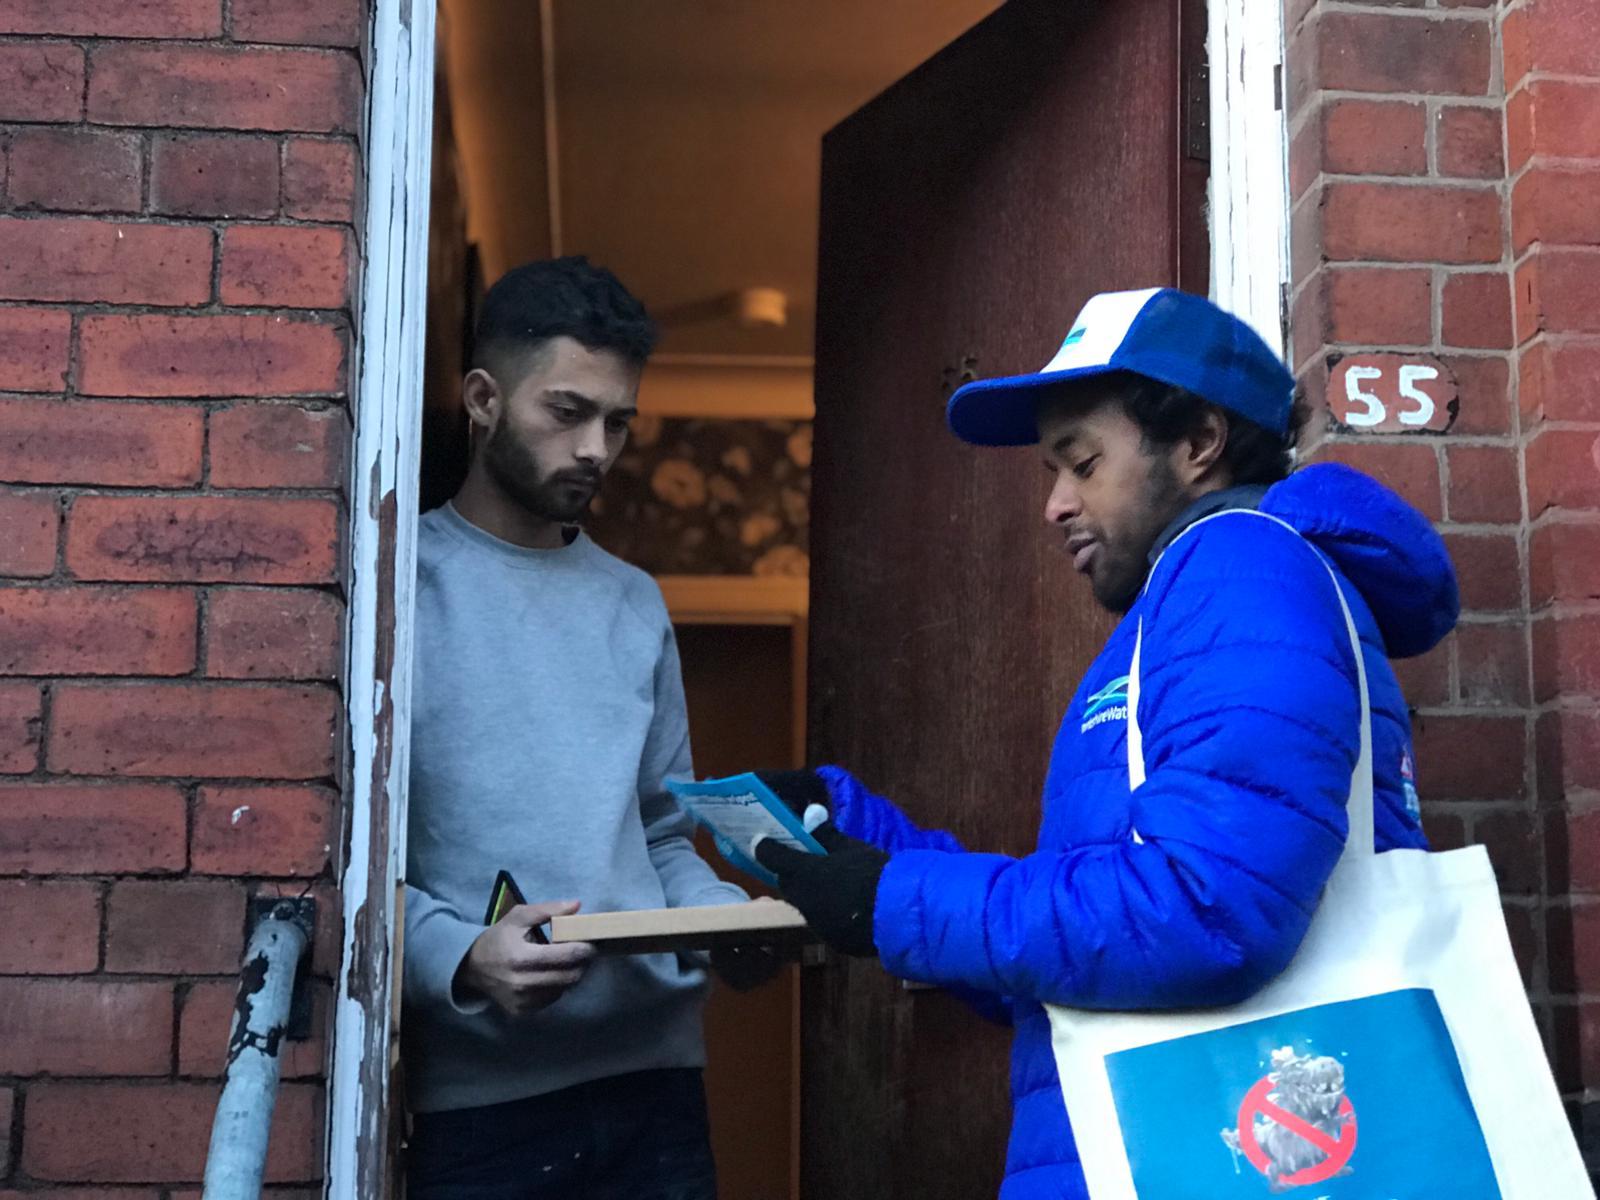 Brand ambassadors going door to door, marketing campaign, active campaign, promotion